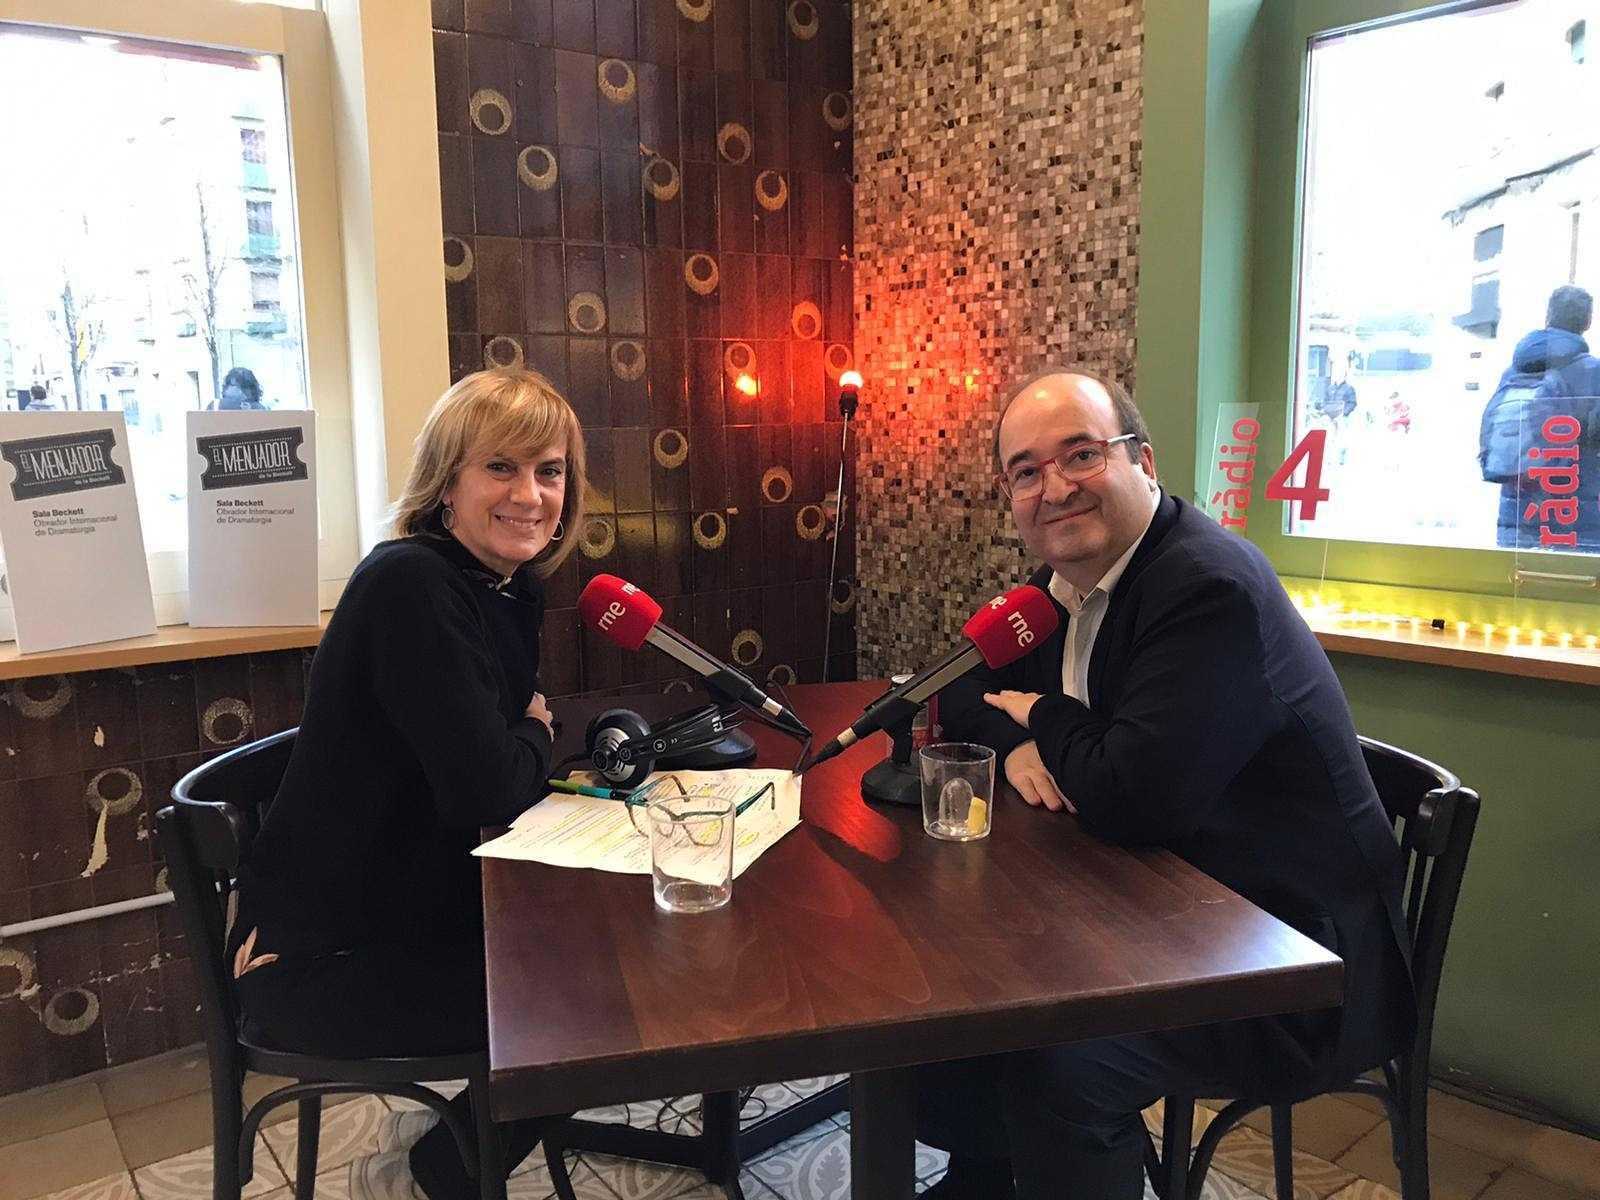 Gemma Nierga entrevista Miquel Iceta 13/02/20